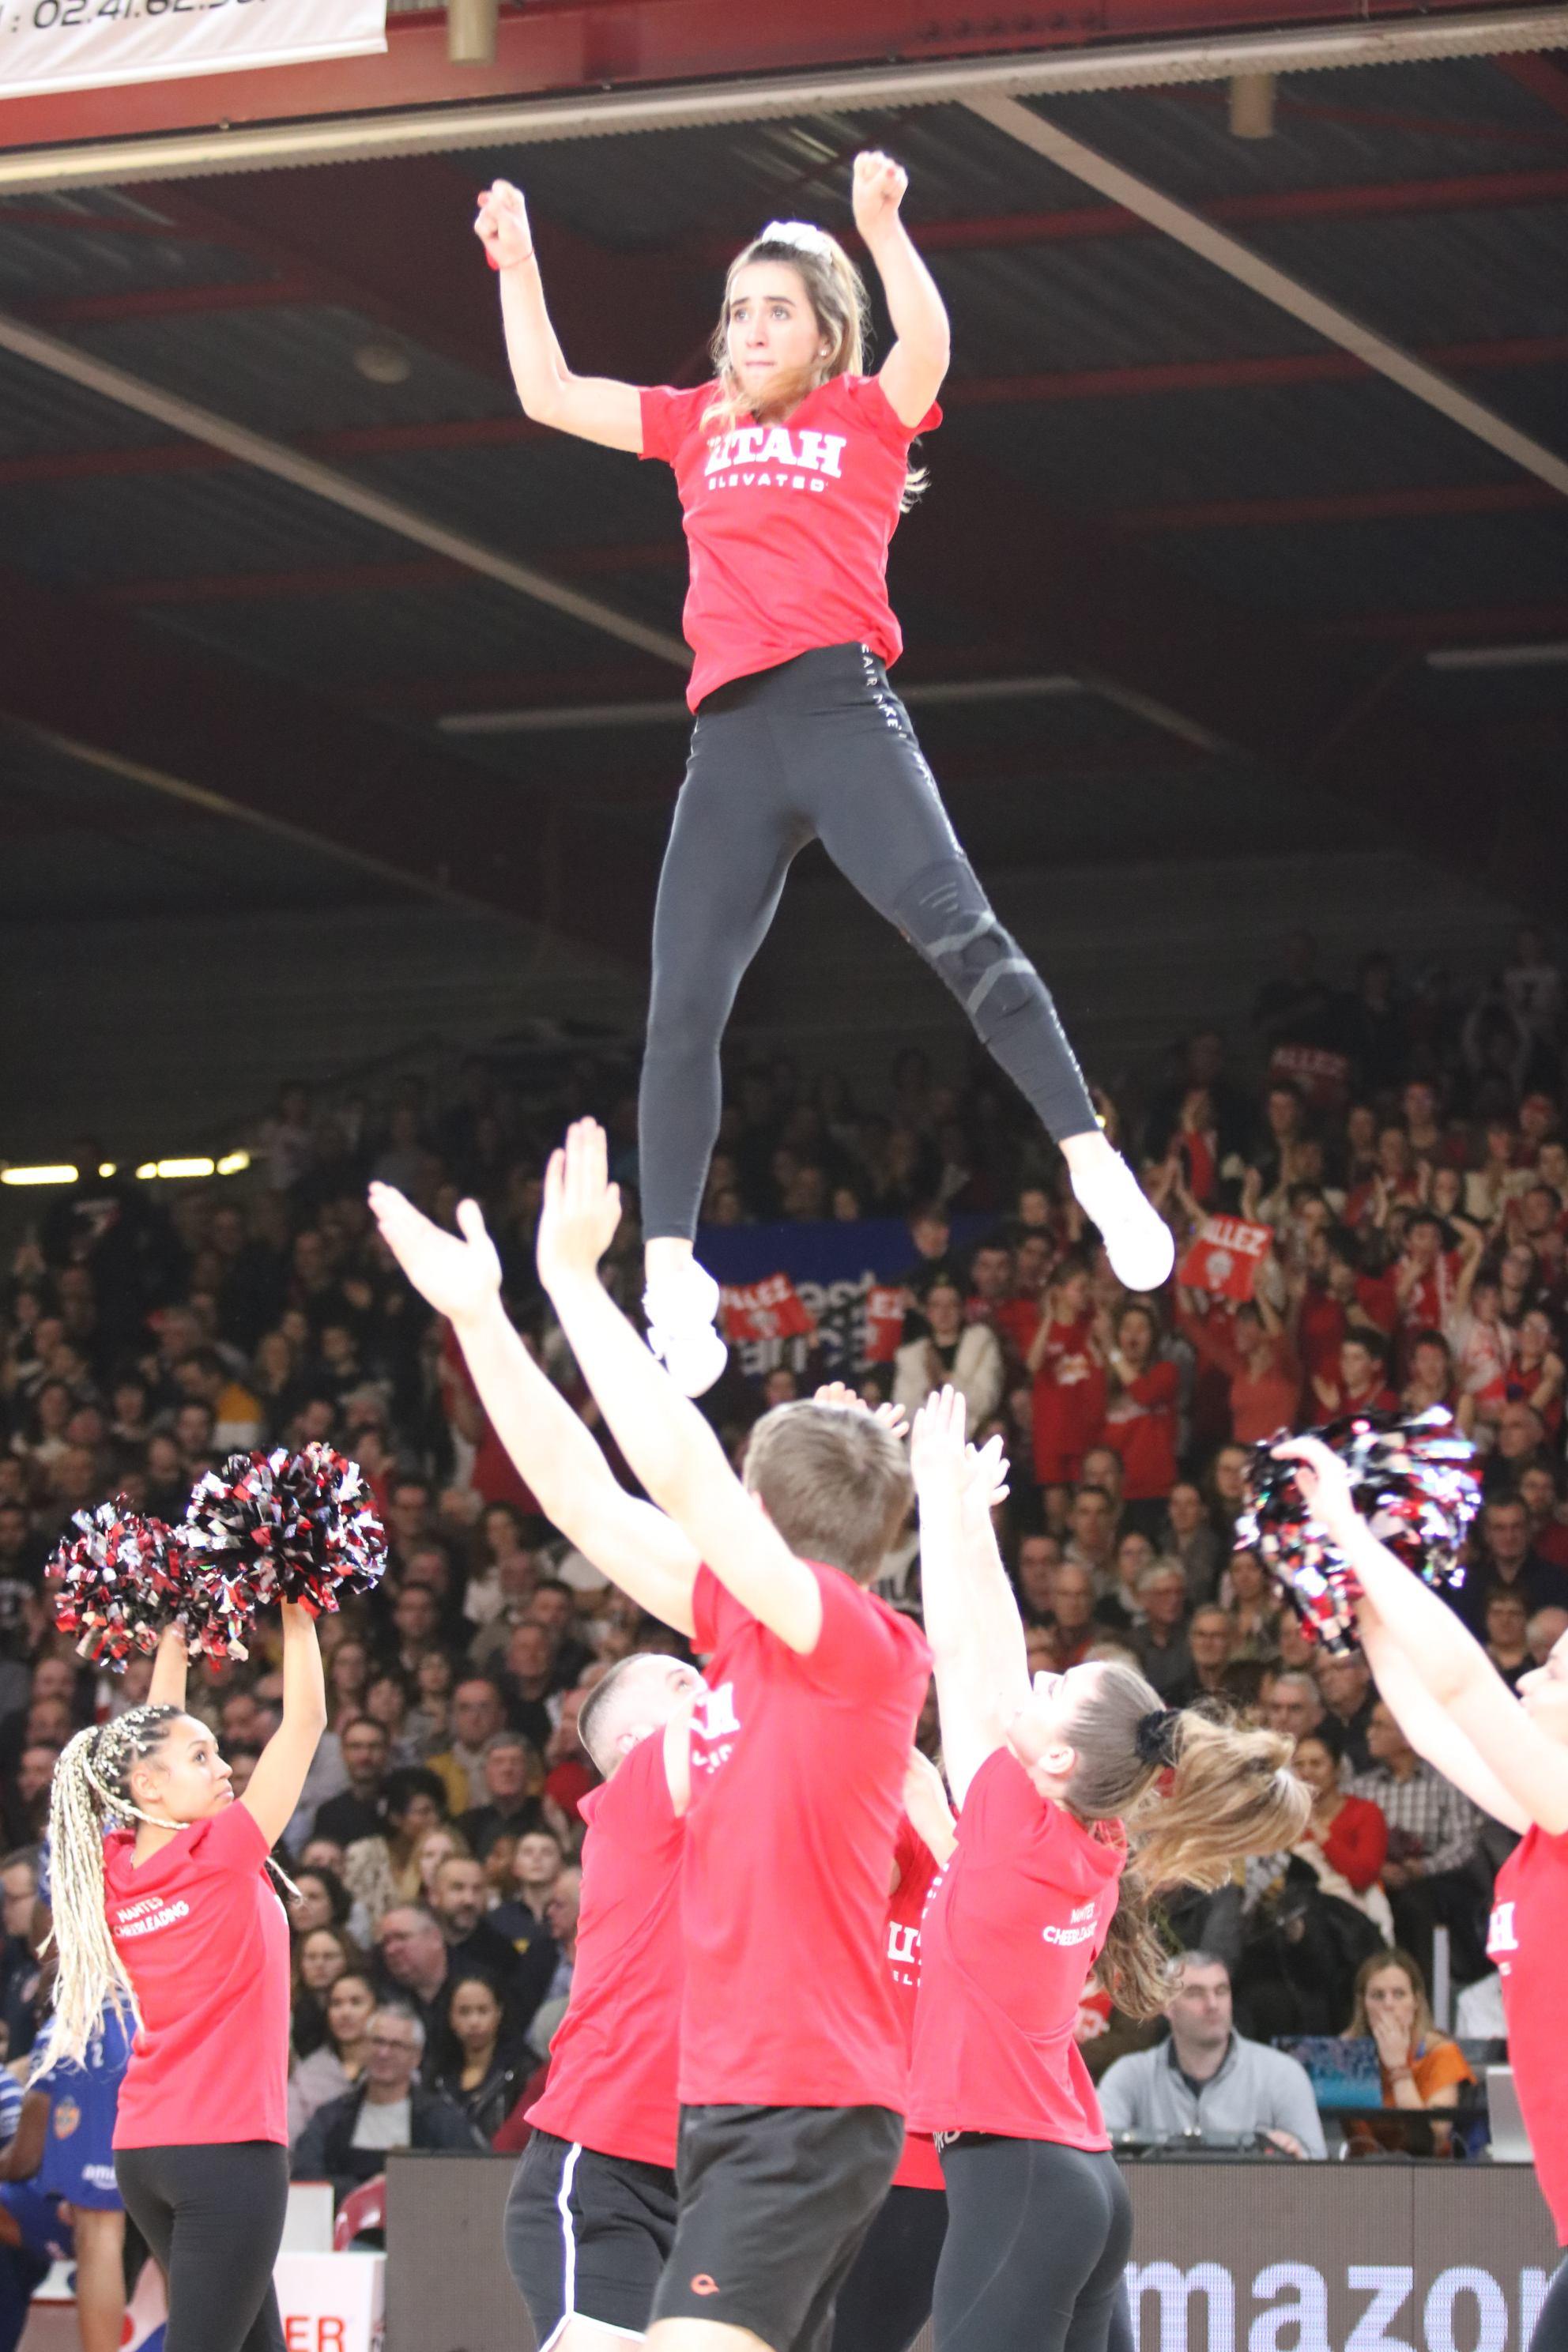 Les Royalti - Nantes Cheerleading vs Gravelines